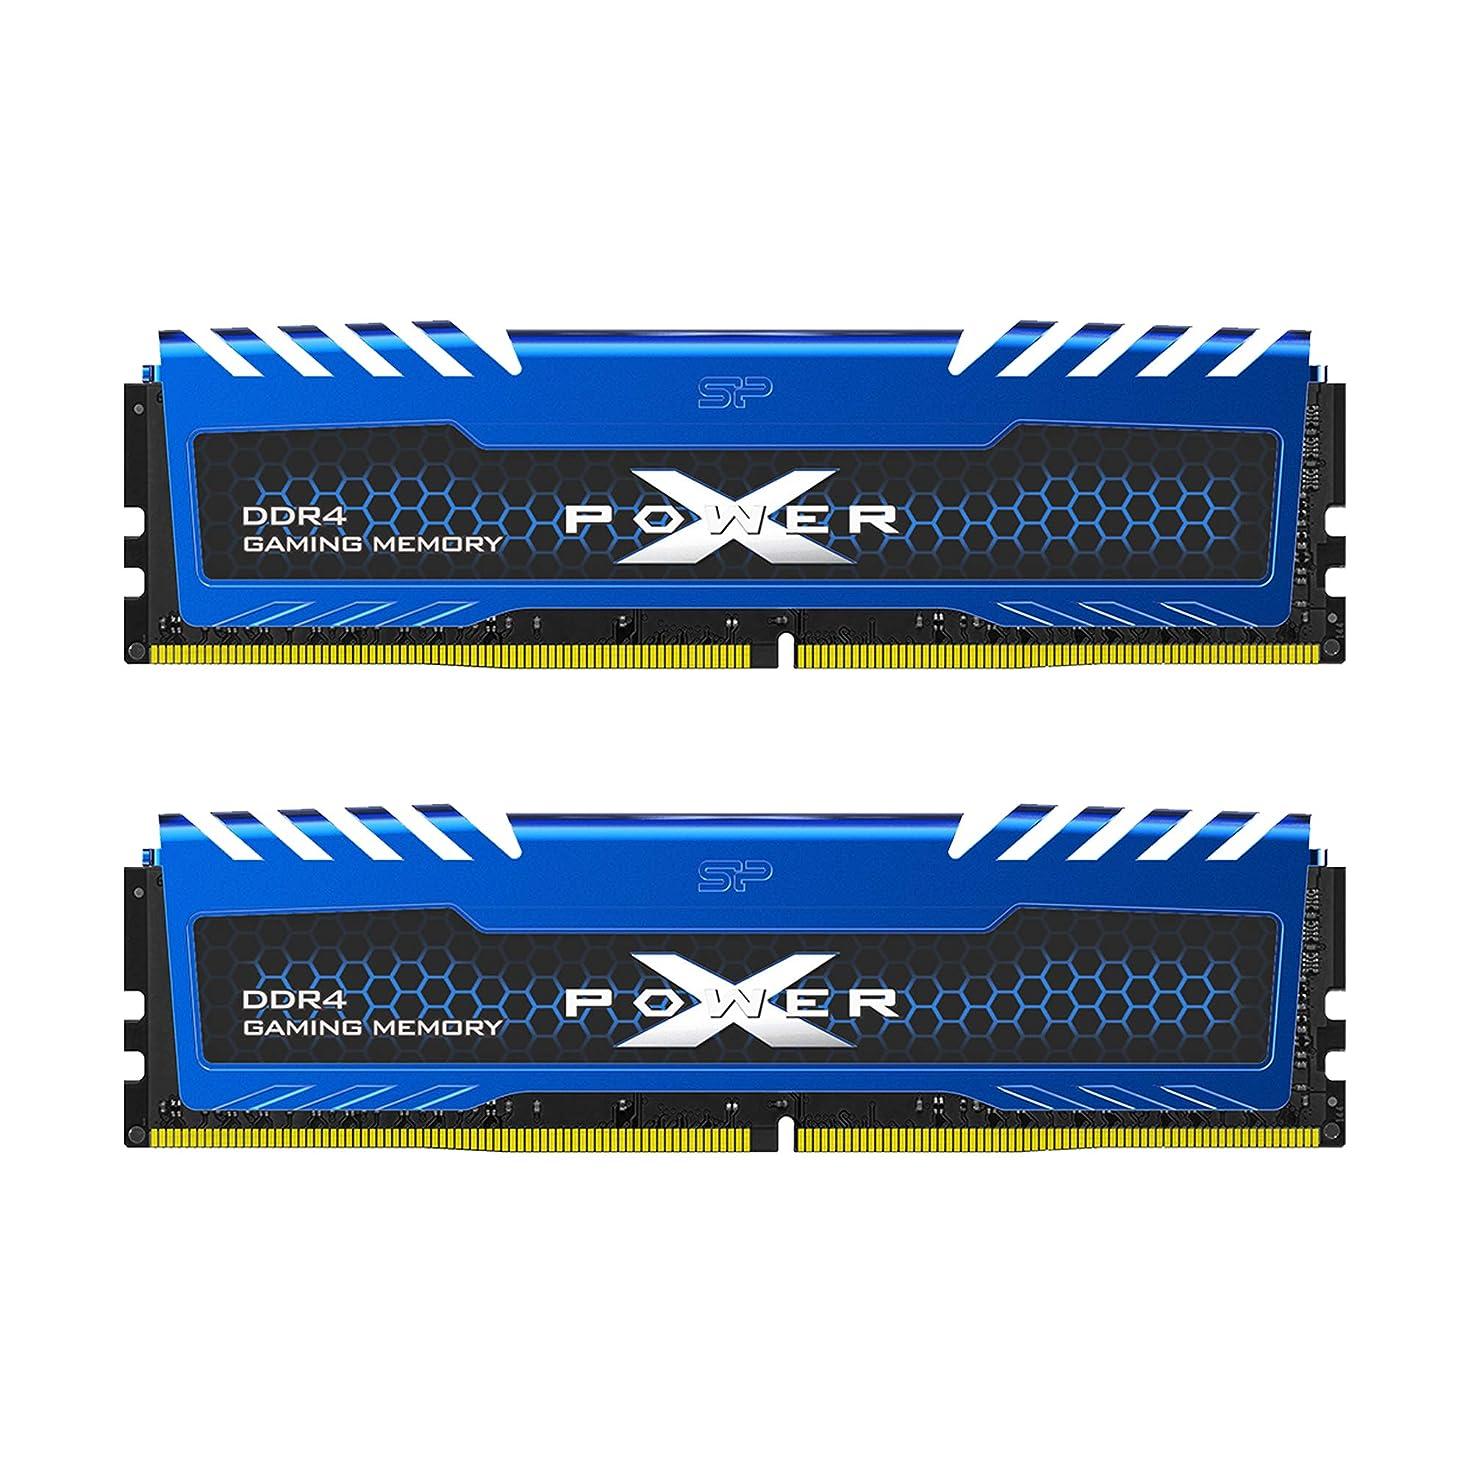 Silicon Power 16GB (8GBx2) XPOWER Turbine Gaming DDR4-RAM-2666MHz (PC4 21300) 288-pin CL16 1.2V Non ECC Unbuffered UDIMM-Desktop Memory Module - Low Voltage